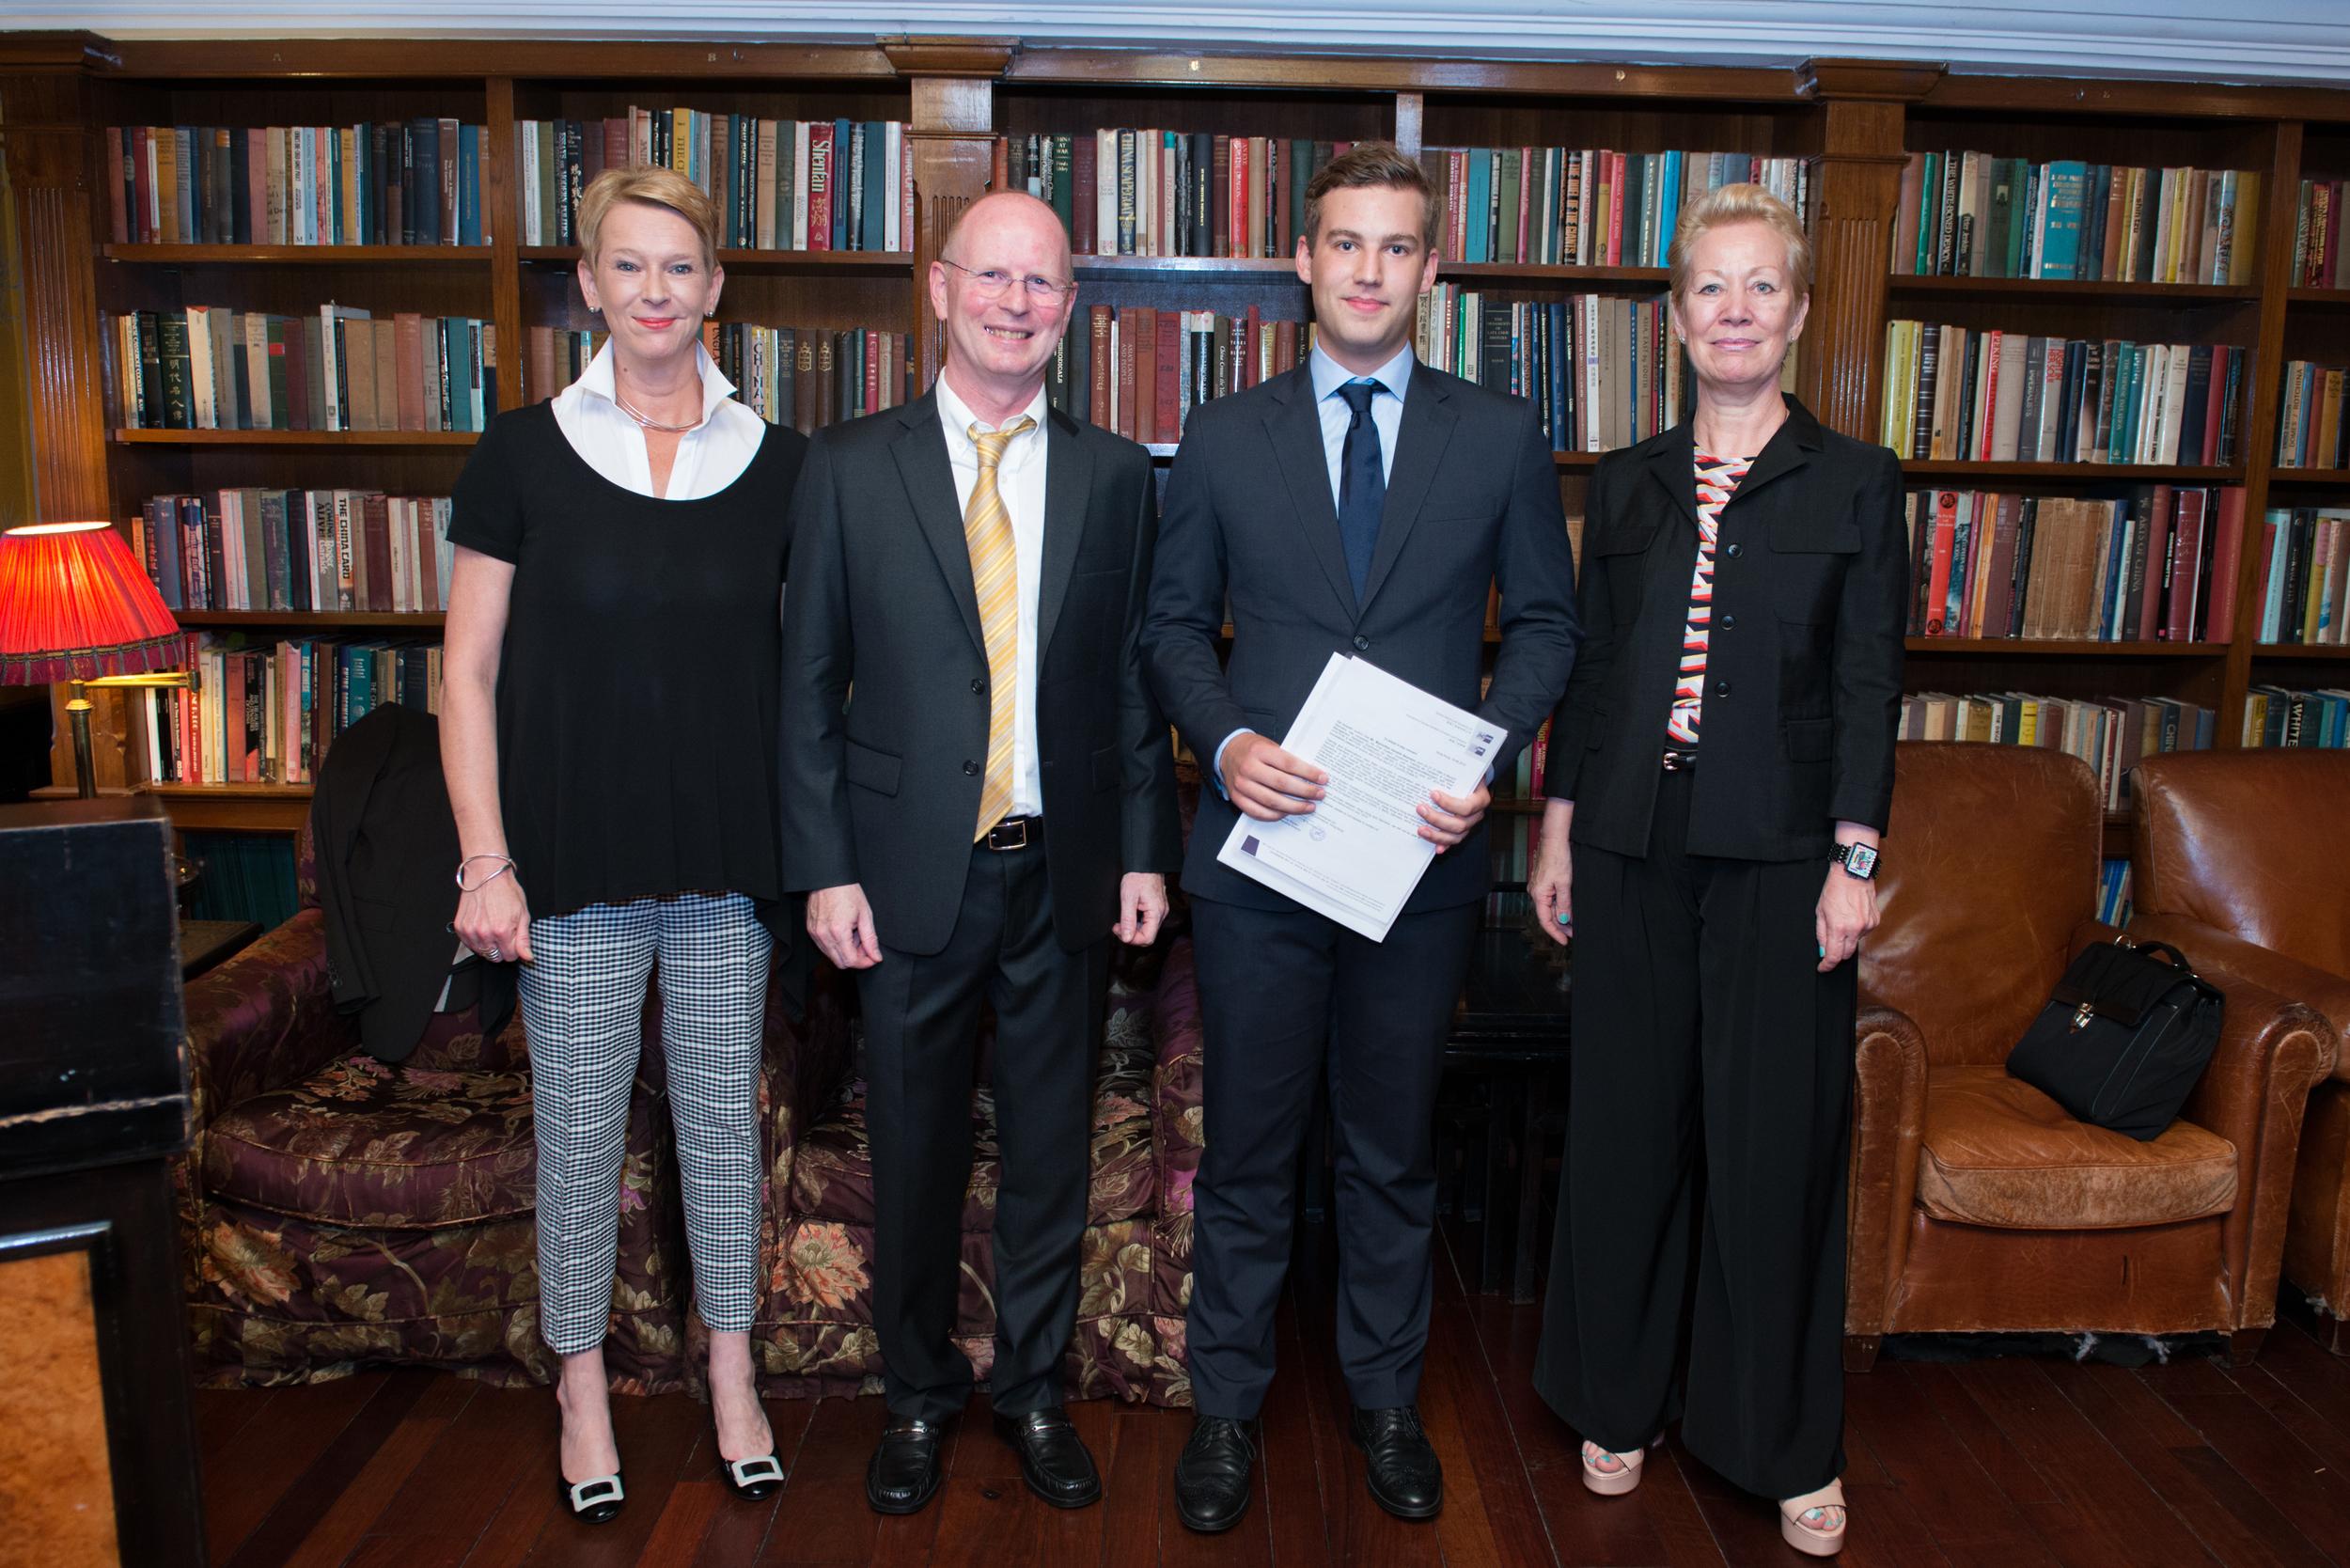 Sabine Florian (Director of GCIC), Uwe Franske (Head of GSIS Business College), Max Neumann (VAMT Trainee), Anette Brandt-Damman (Principal of GSIS)